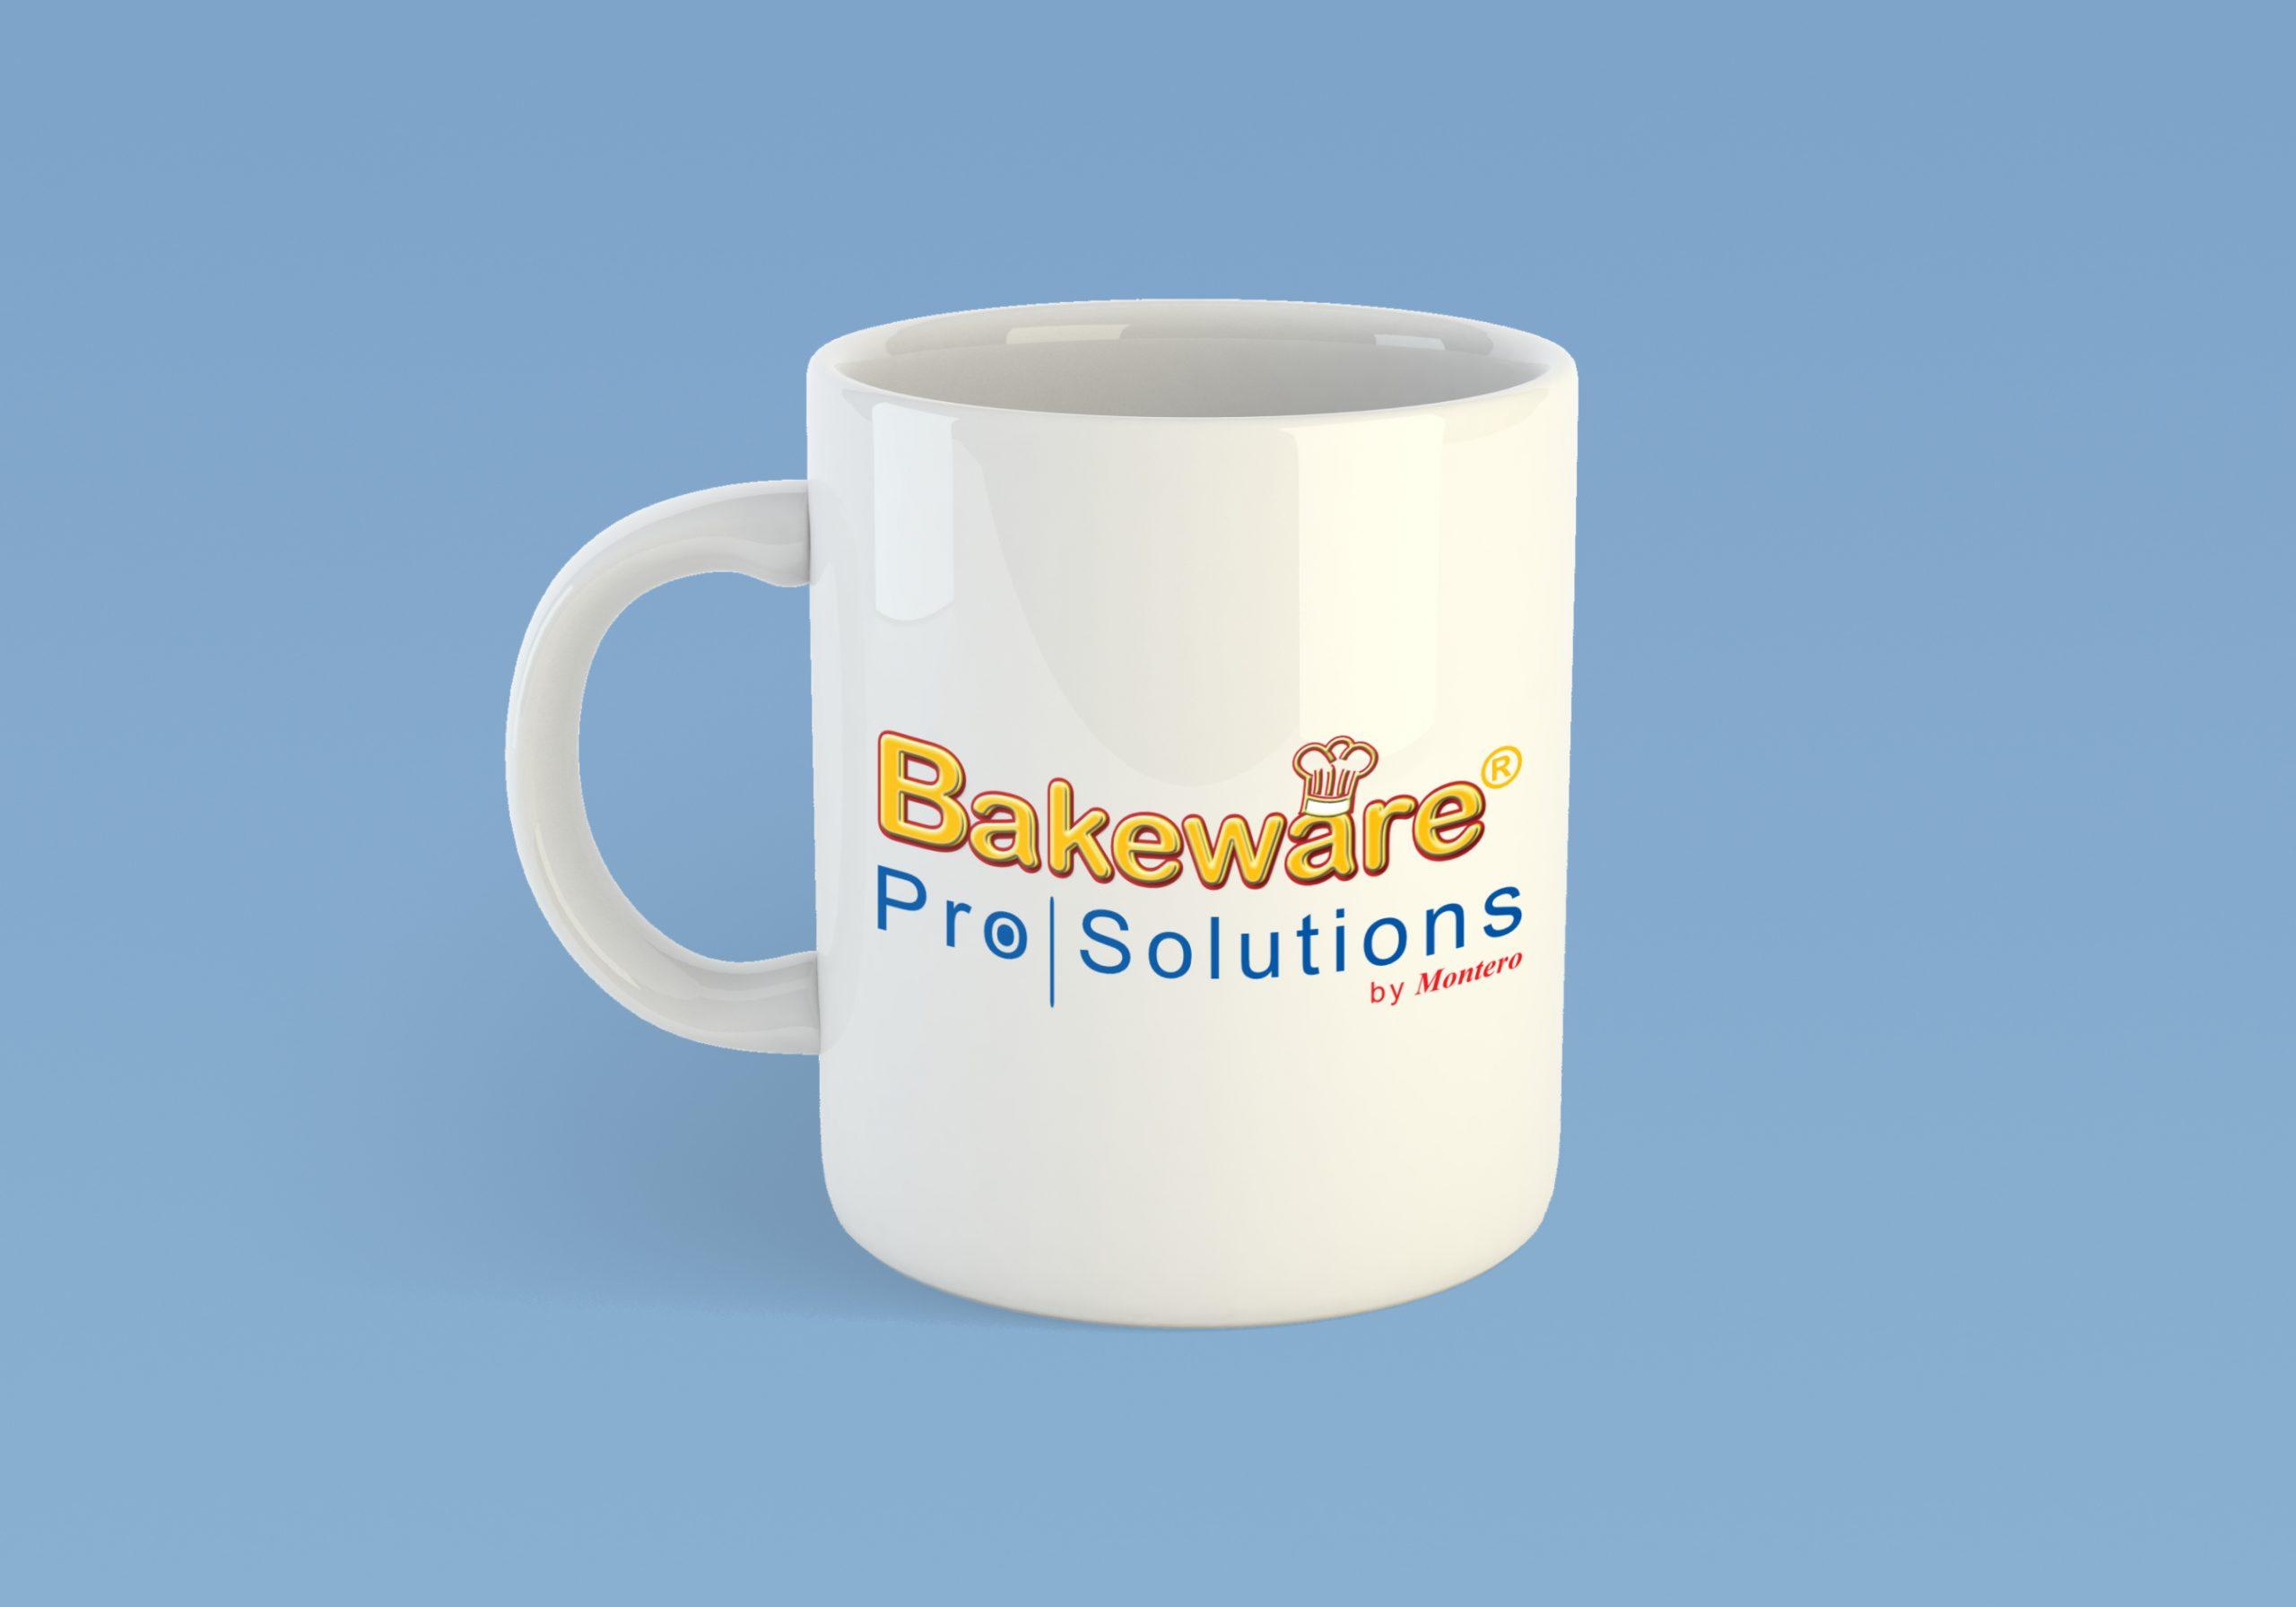 Bakeware Mug